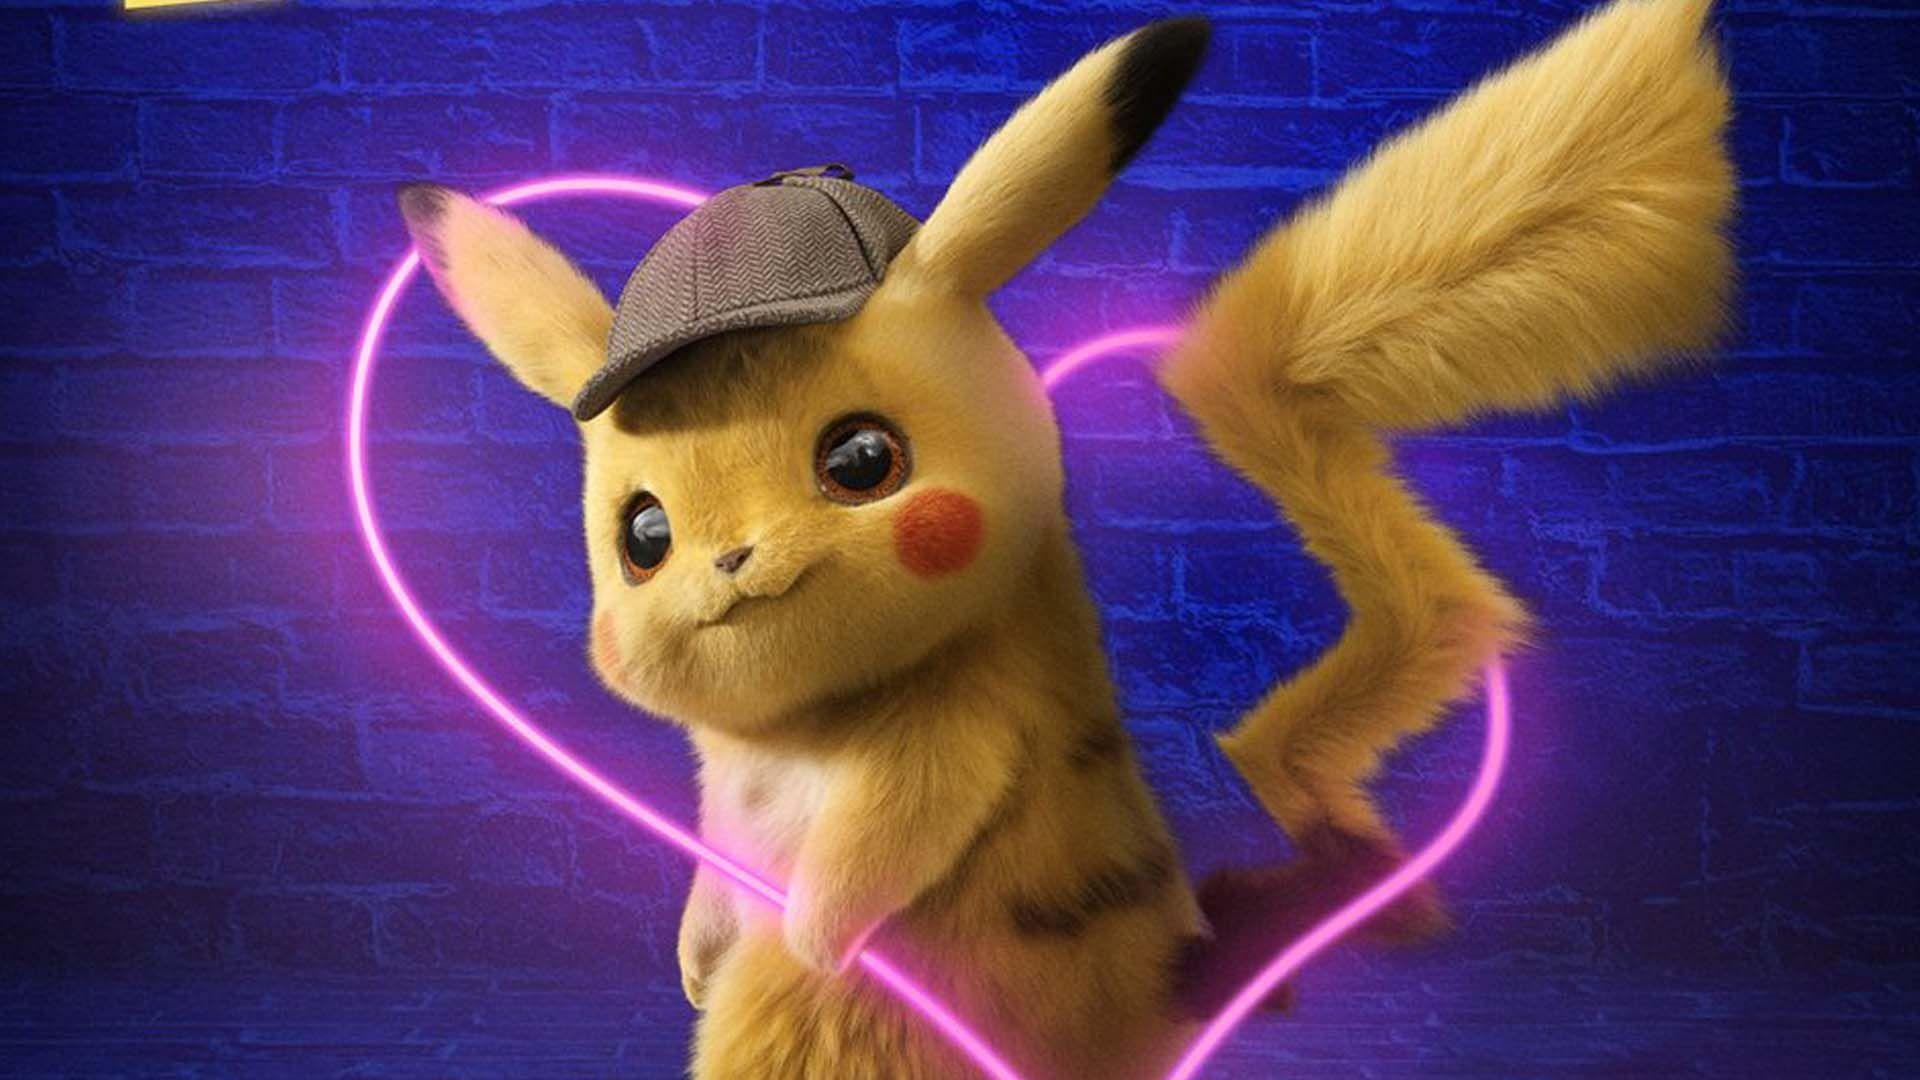 Pokemon Detetive Pikachu Sai Um Pouco Dos Moldes Das Historias Tradicionais De Pokemon E Aqui A Criatura Pikachu Pikachu Pikachu Papel De Parede Pokemon Fofo